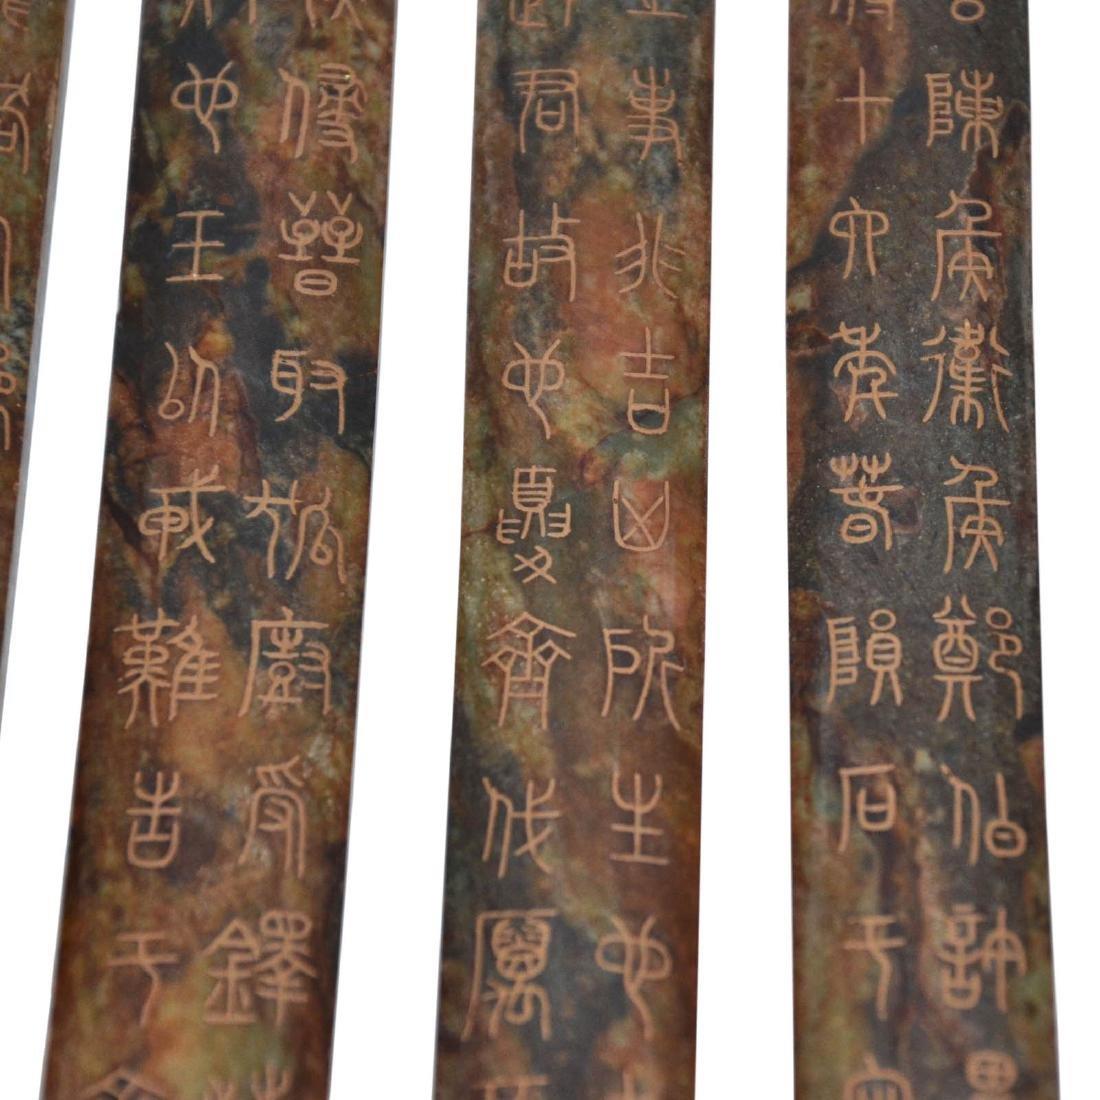 Celadon Jade Tablet with 11 Excerpts - 3